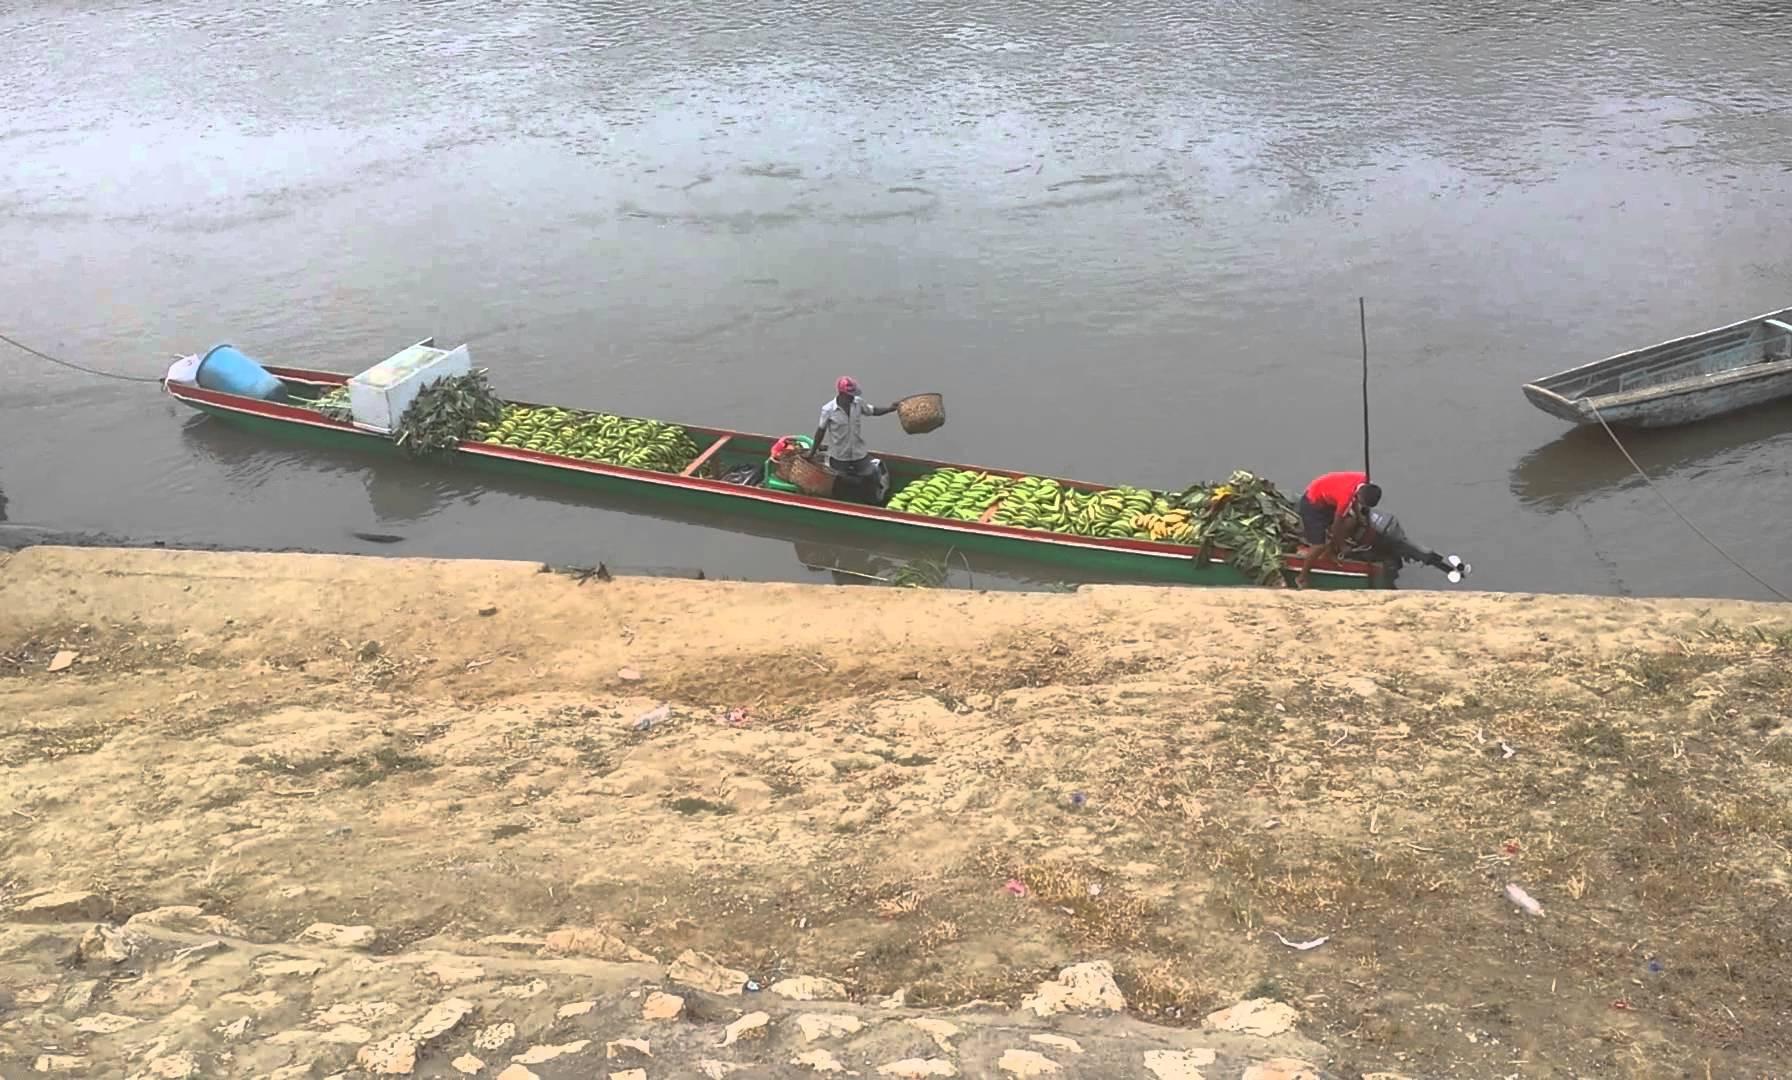 Unloading Bananas in Yaviza, Panama